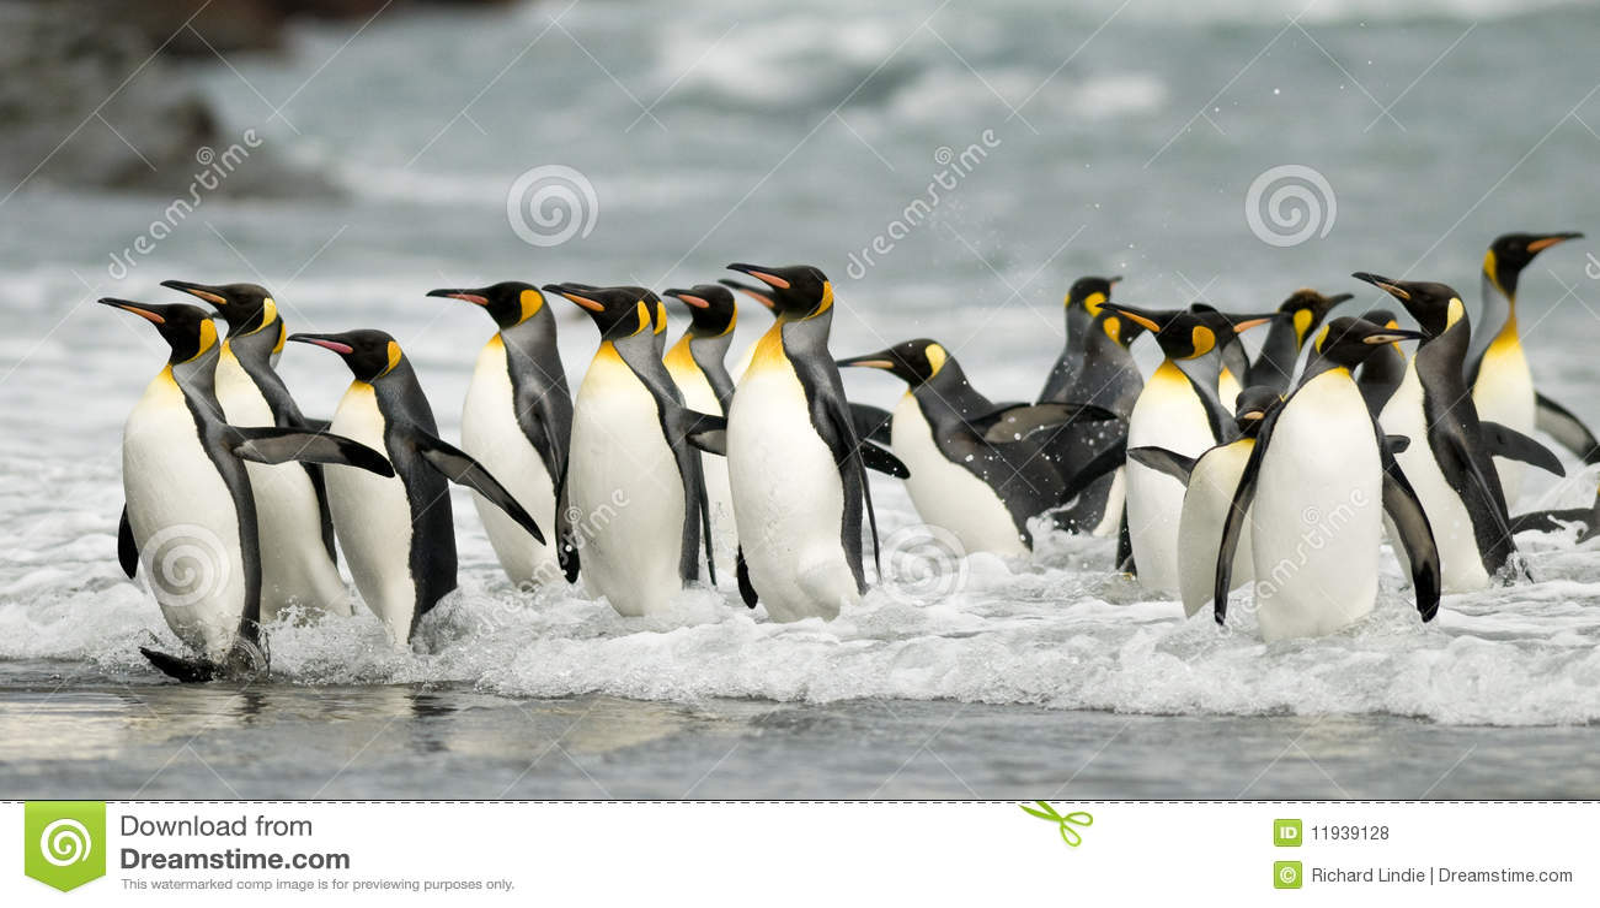 Rei pinguins na ressaca